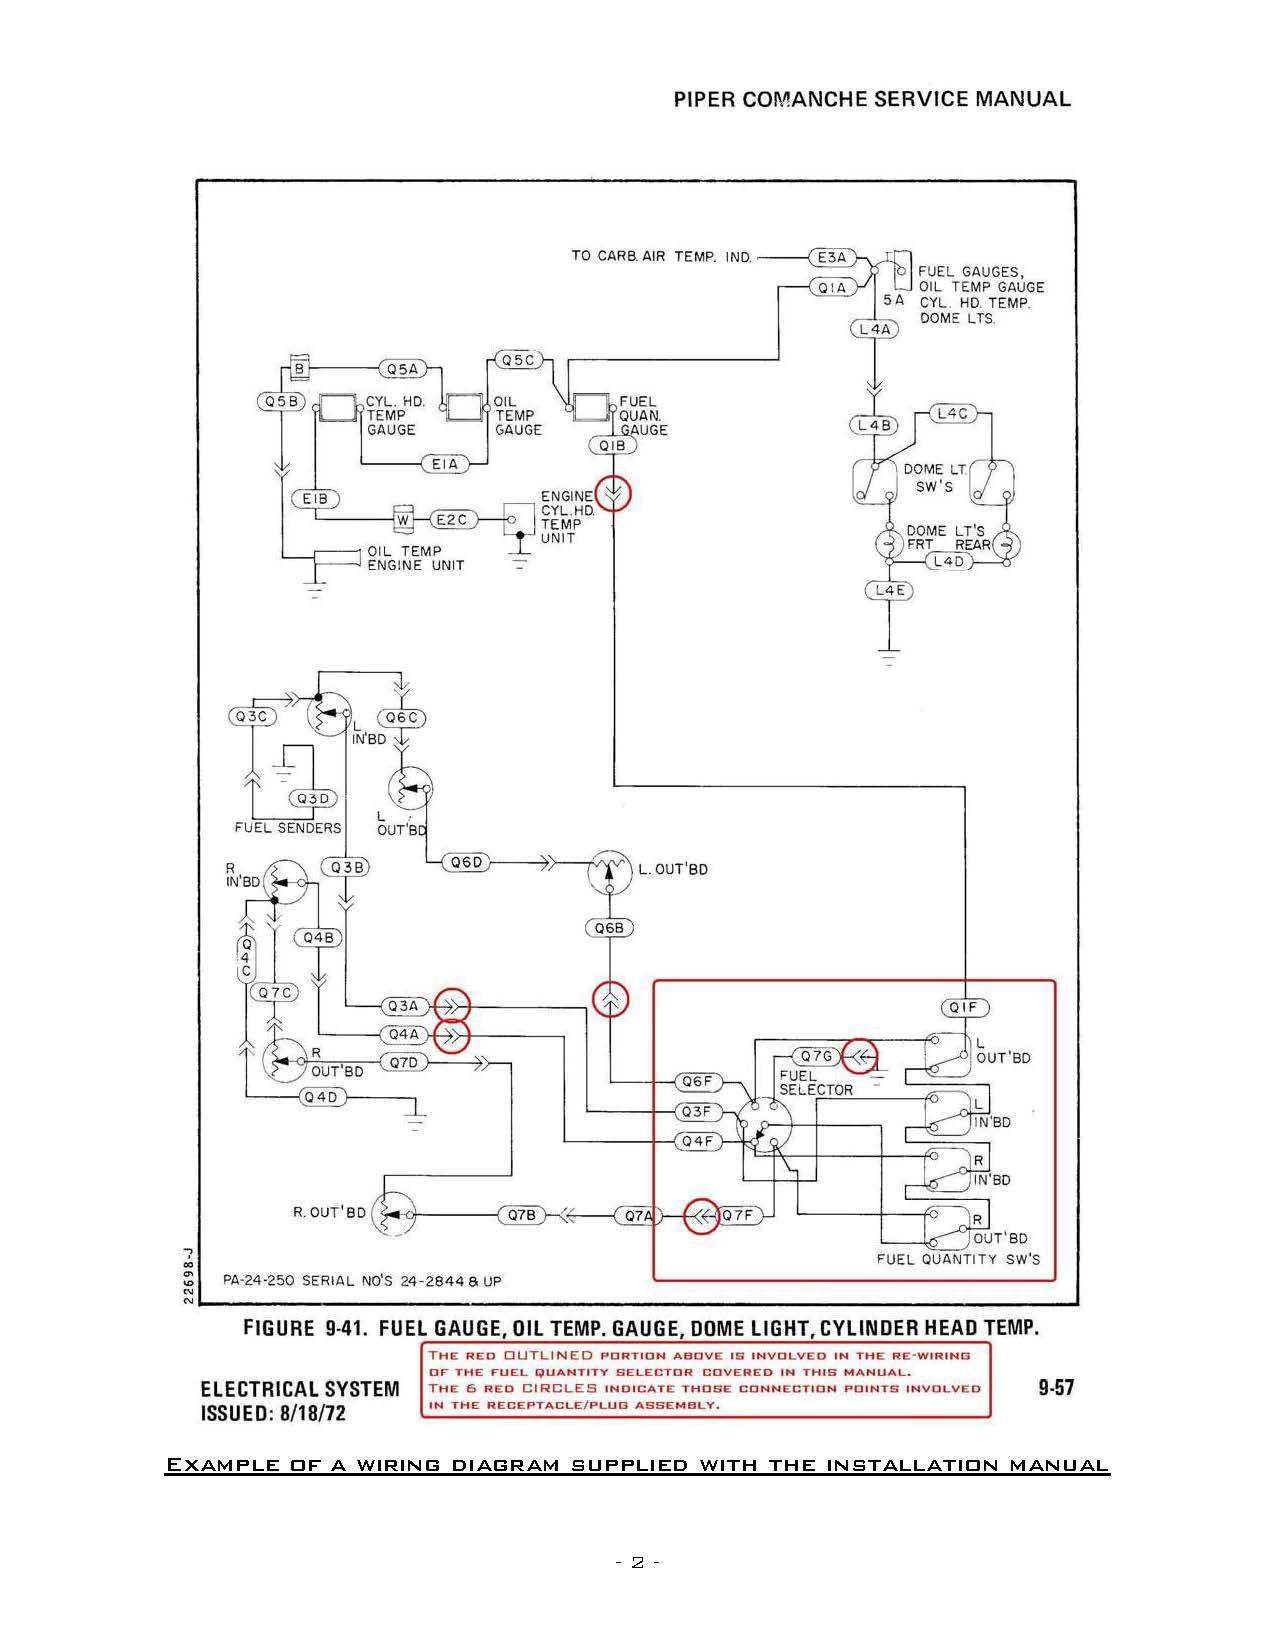 Fuel Quantity Indicator Selector Wiring Diagram